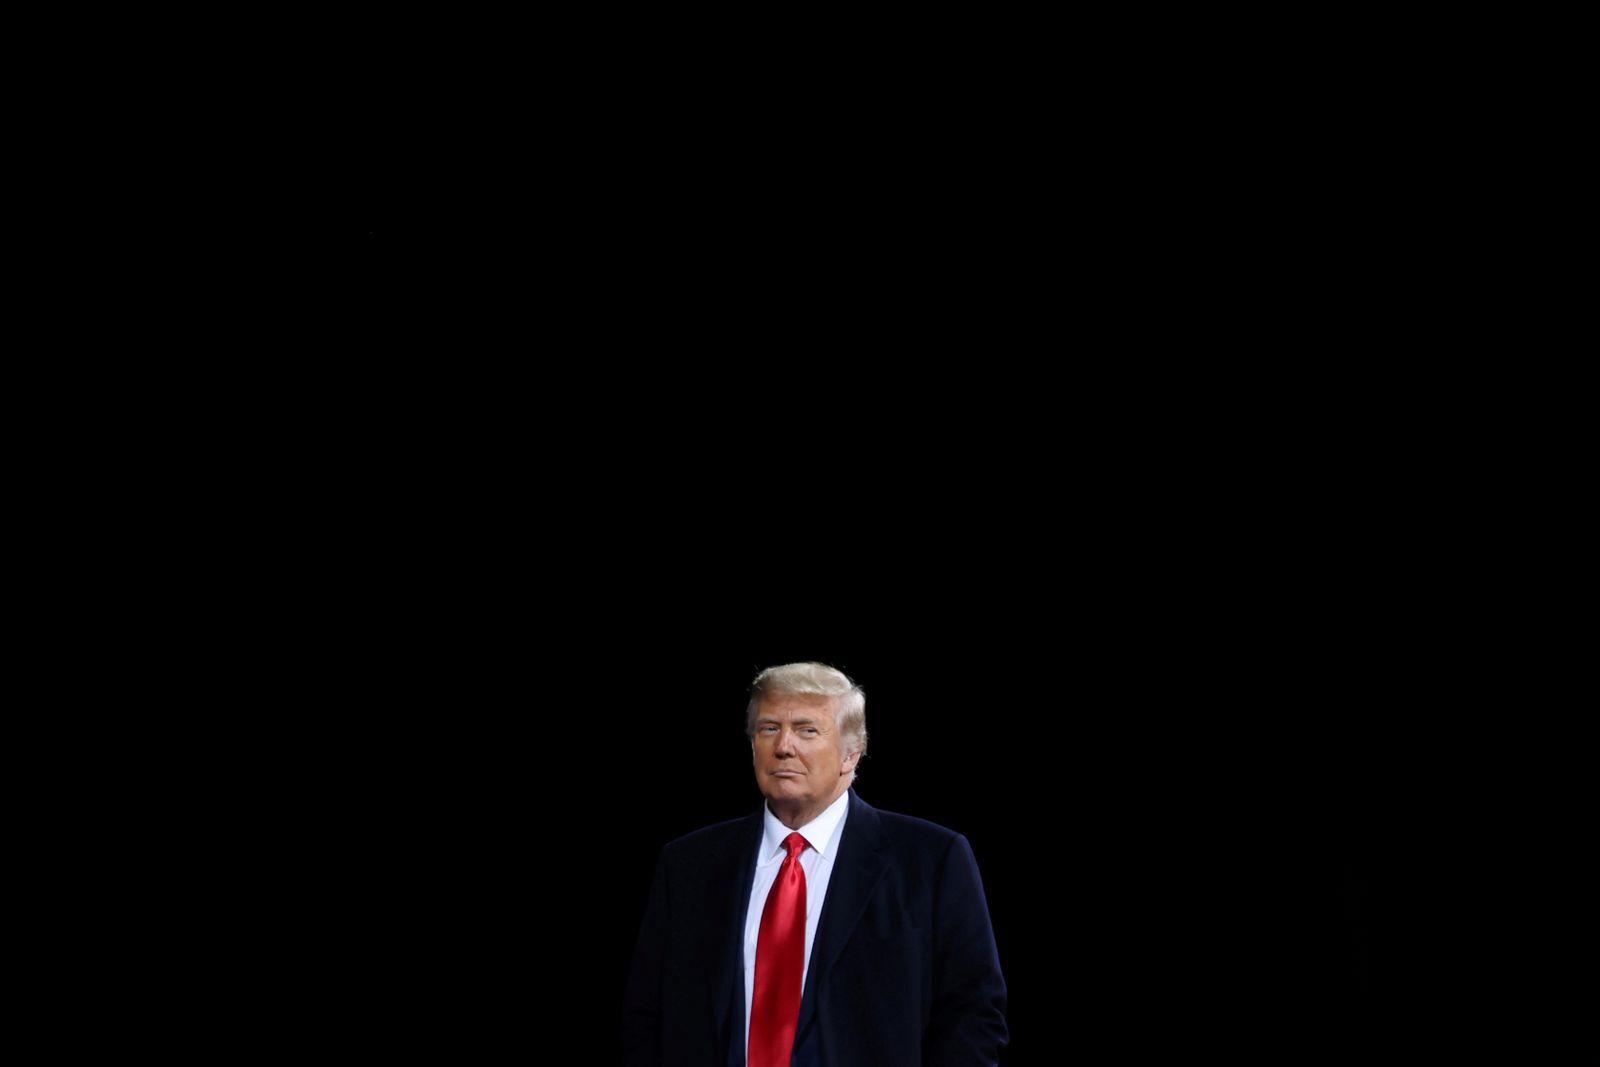 FILE PHOTO: U.S. President Trump campaigns for Republican U.S. senators Perdue and Loeffler during a rally in Valdosta, Georgia